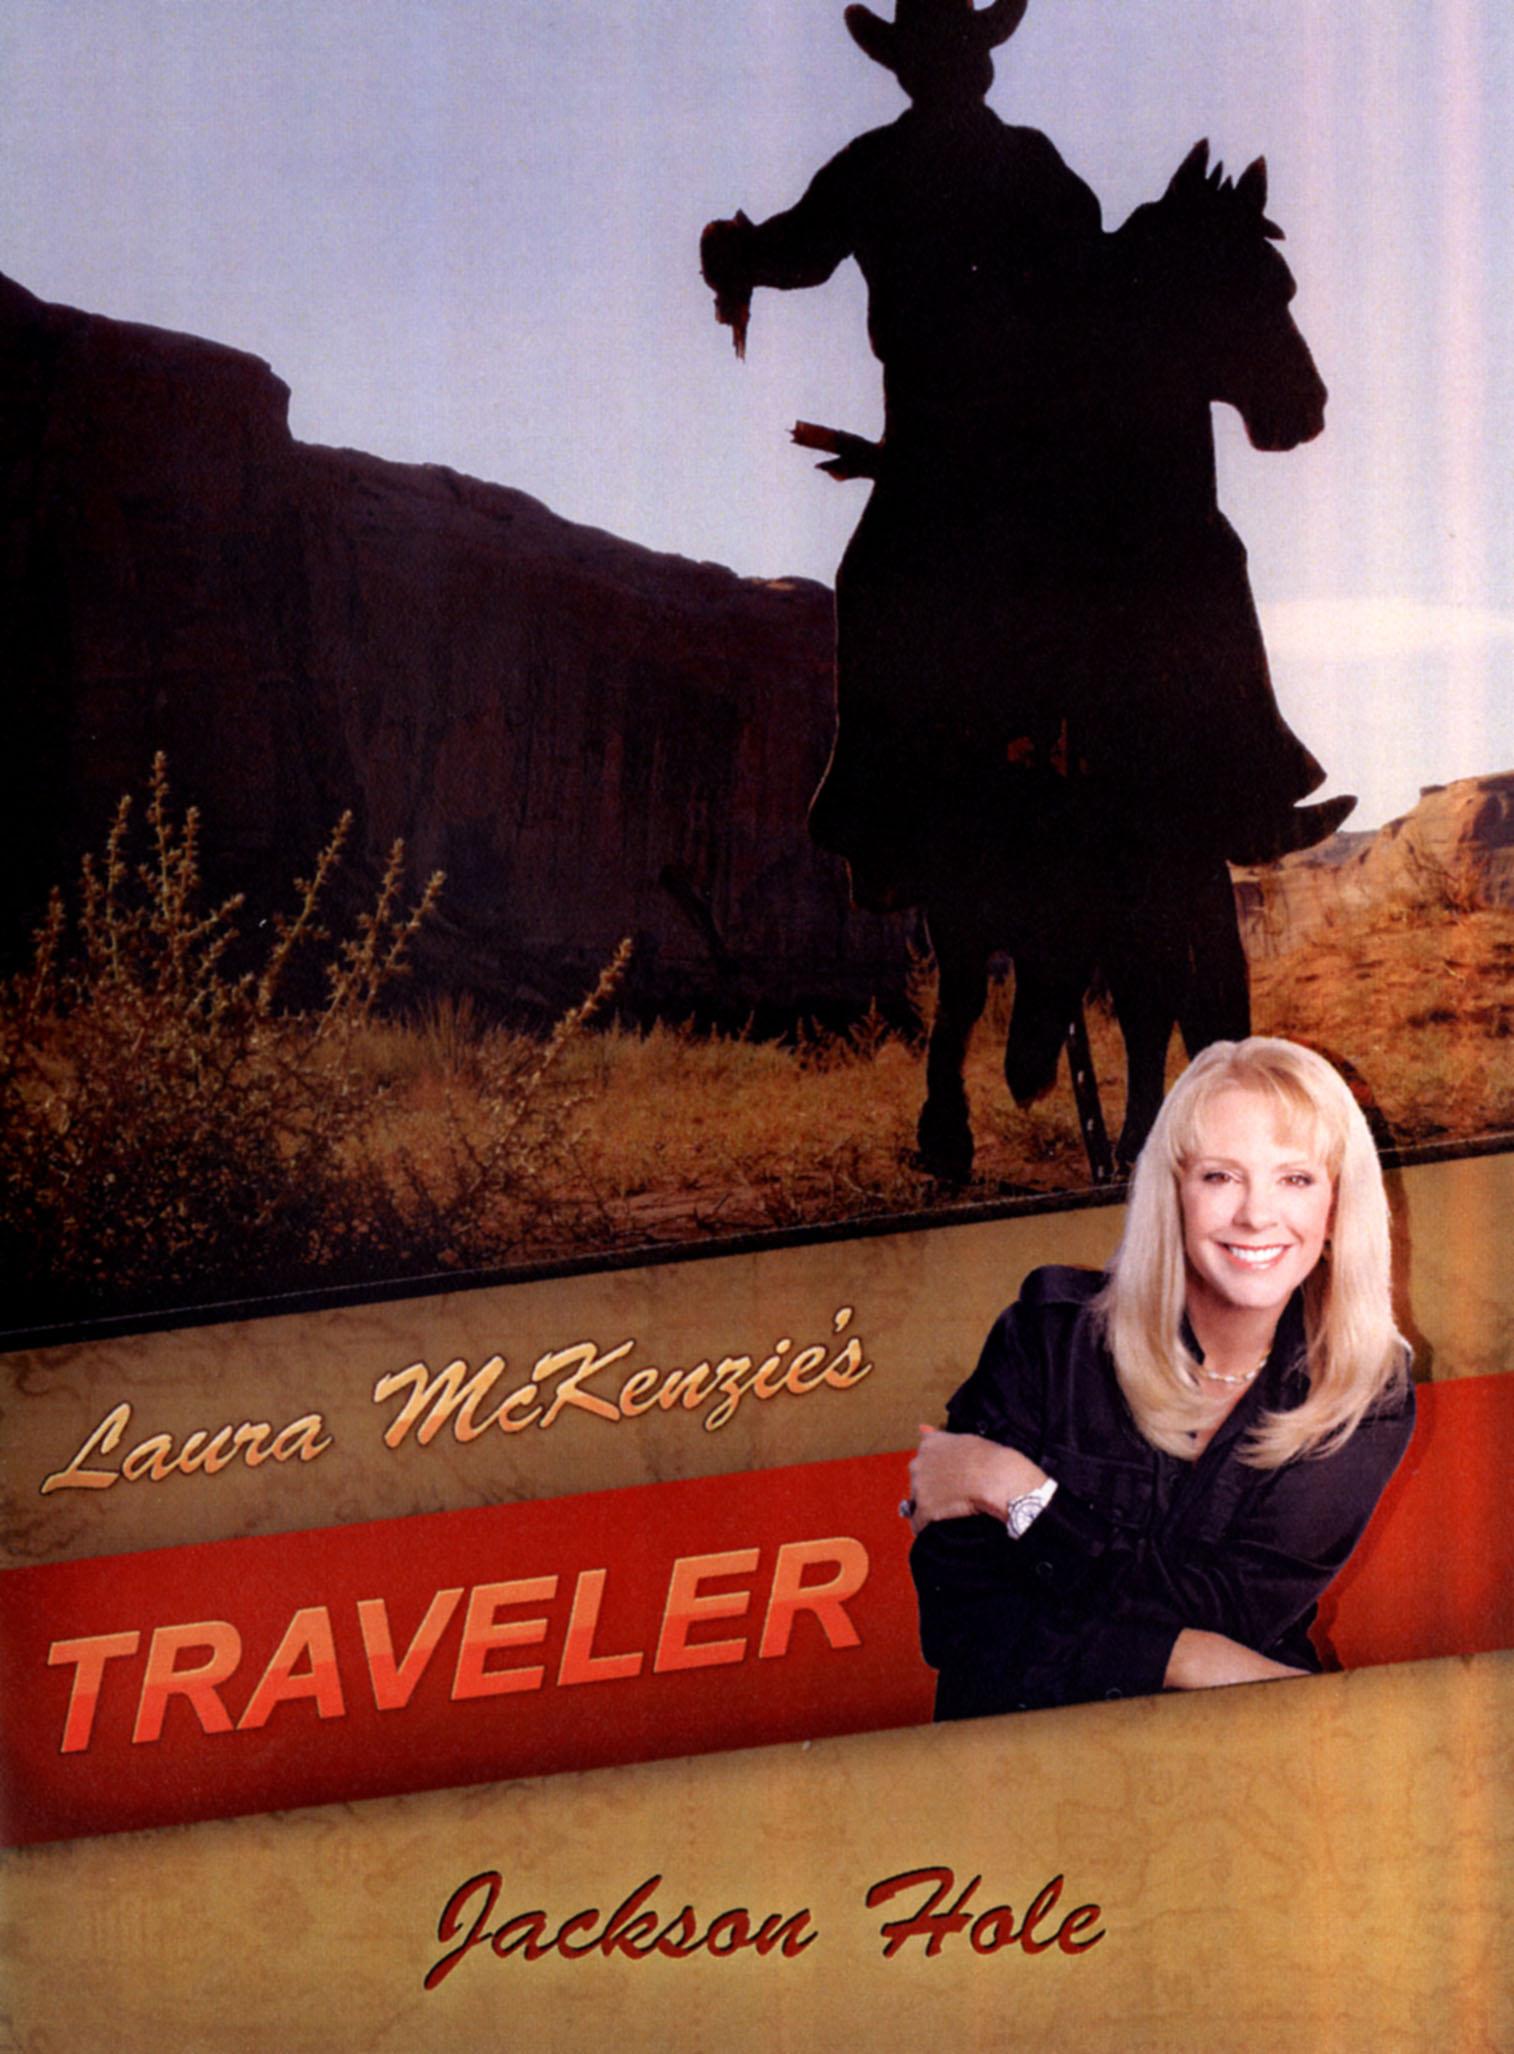 Laura McKenzie's Traveler: Jackson Hole